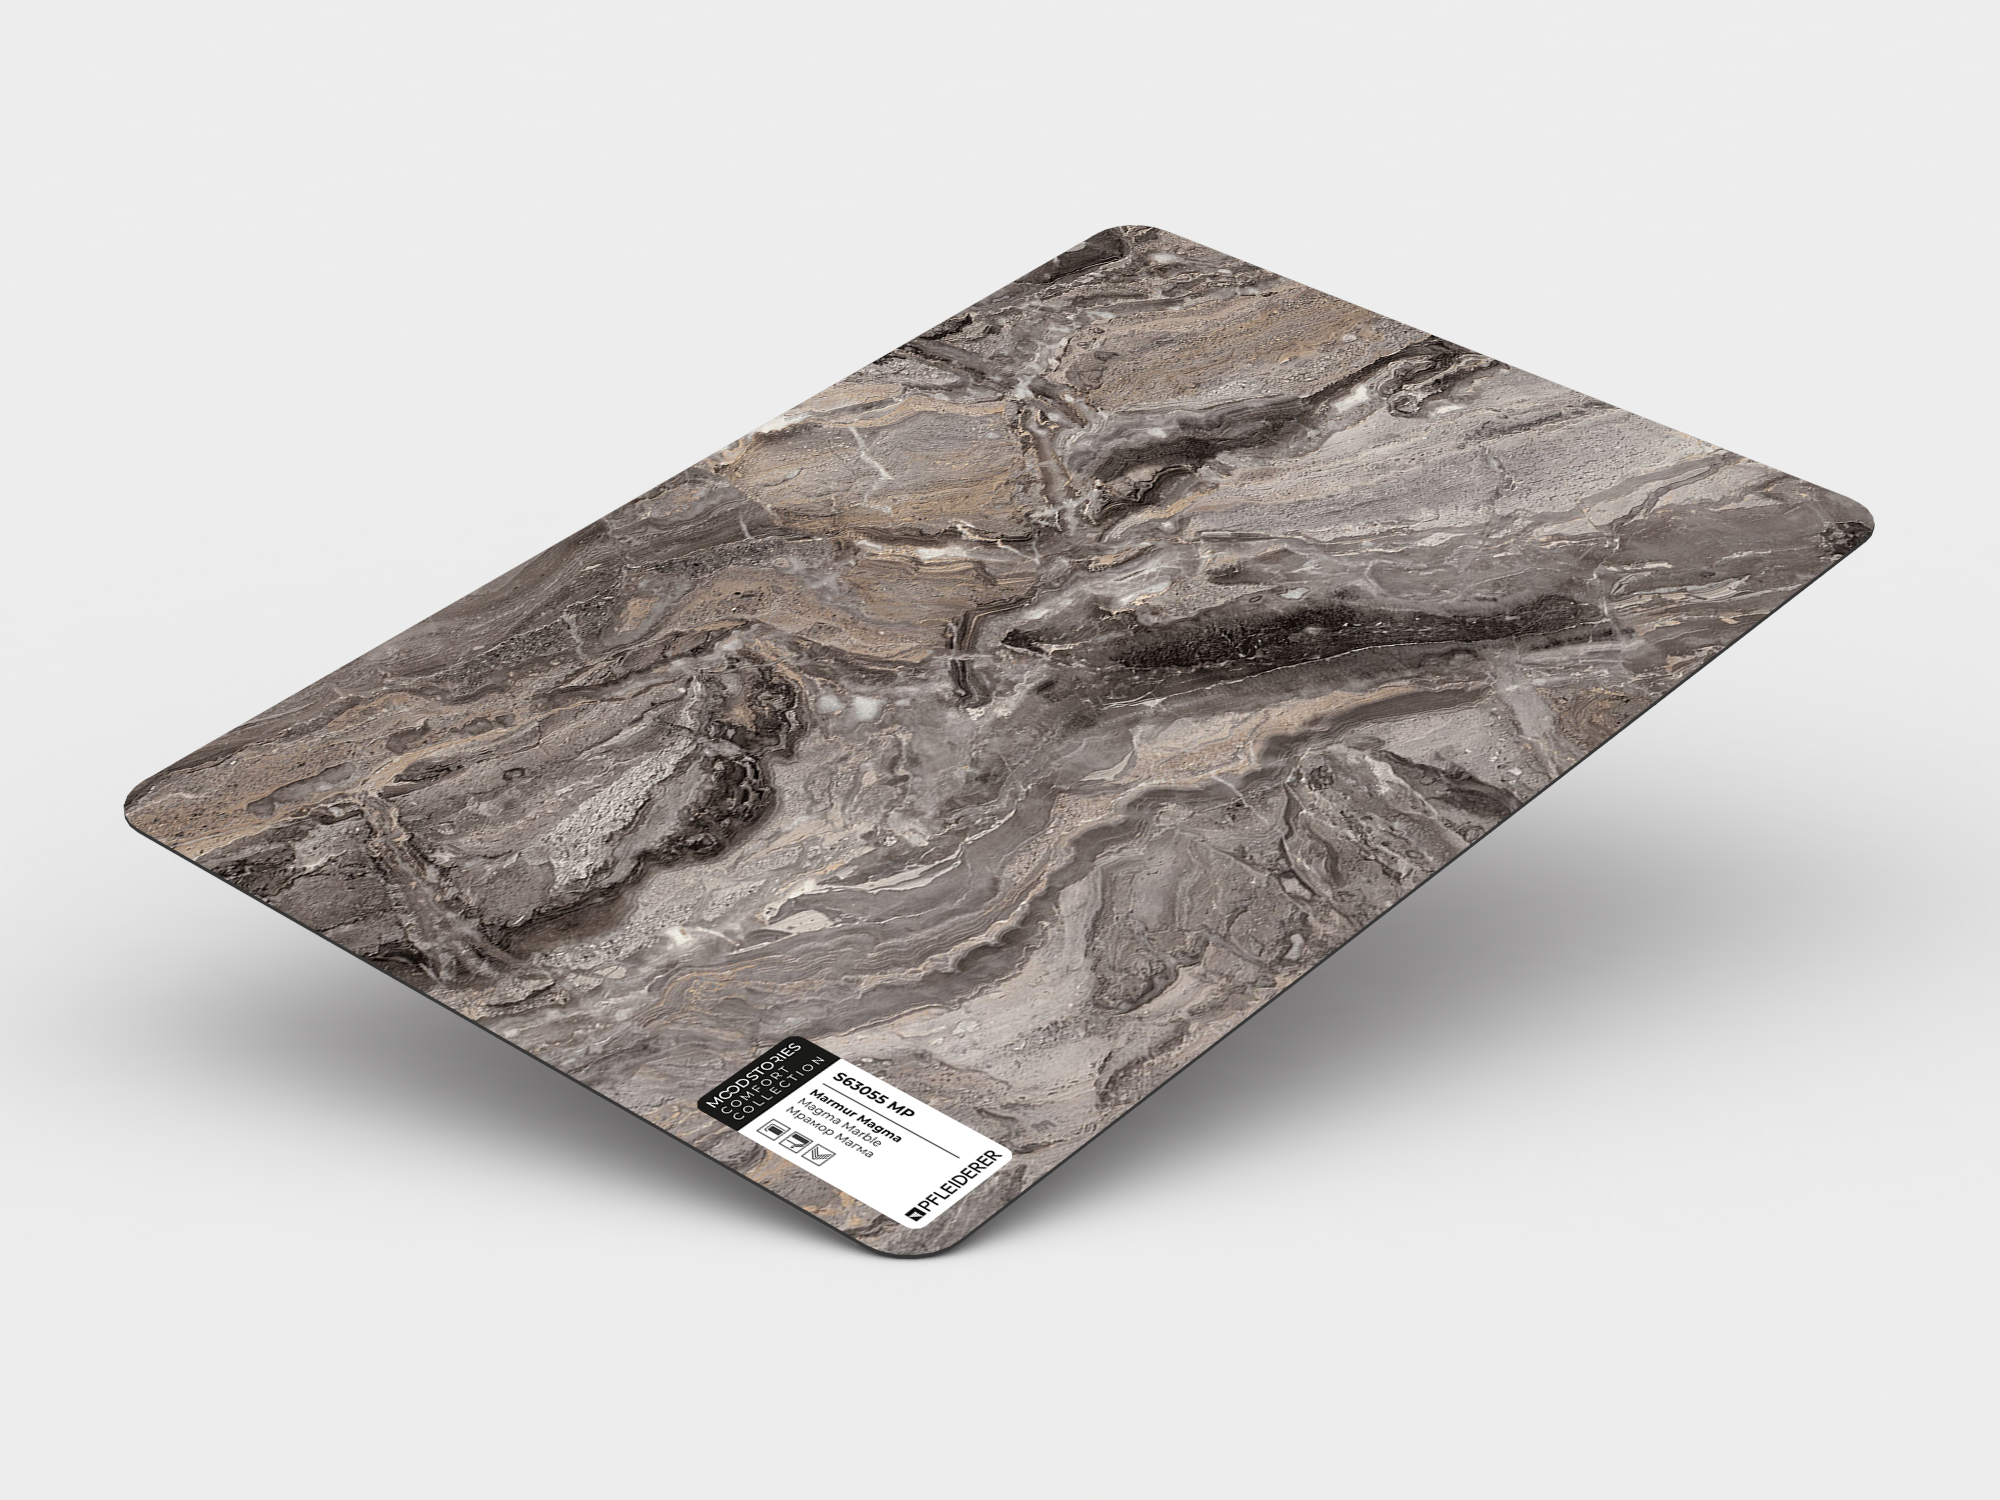 Marmur Magma S63055 MP